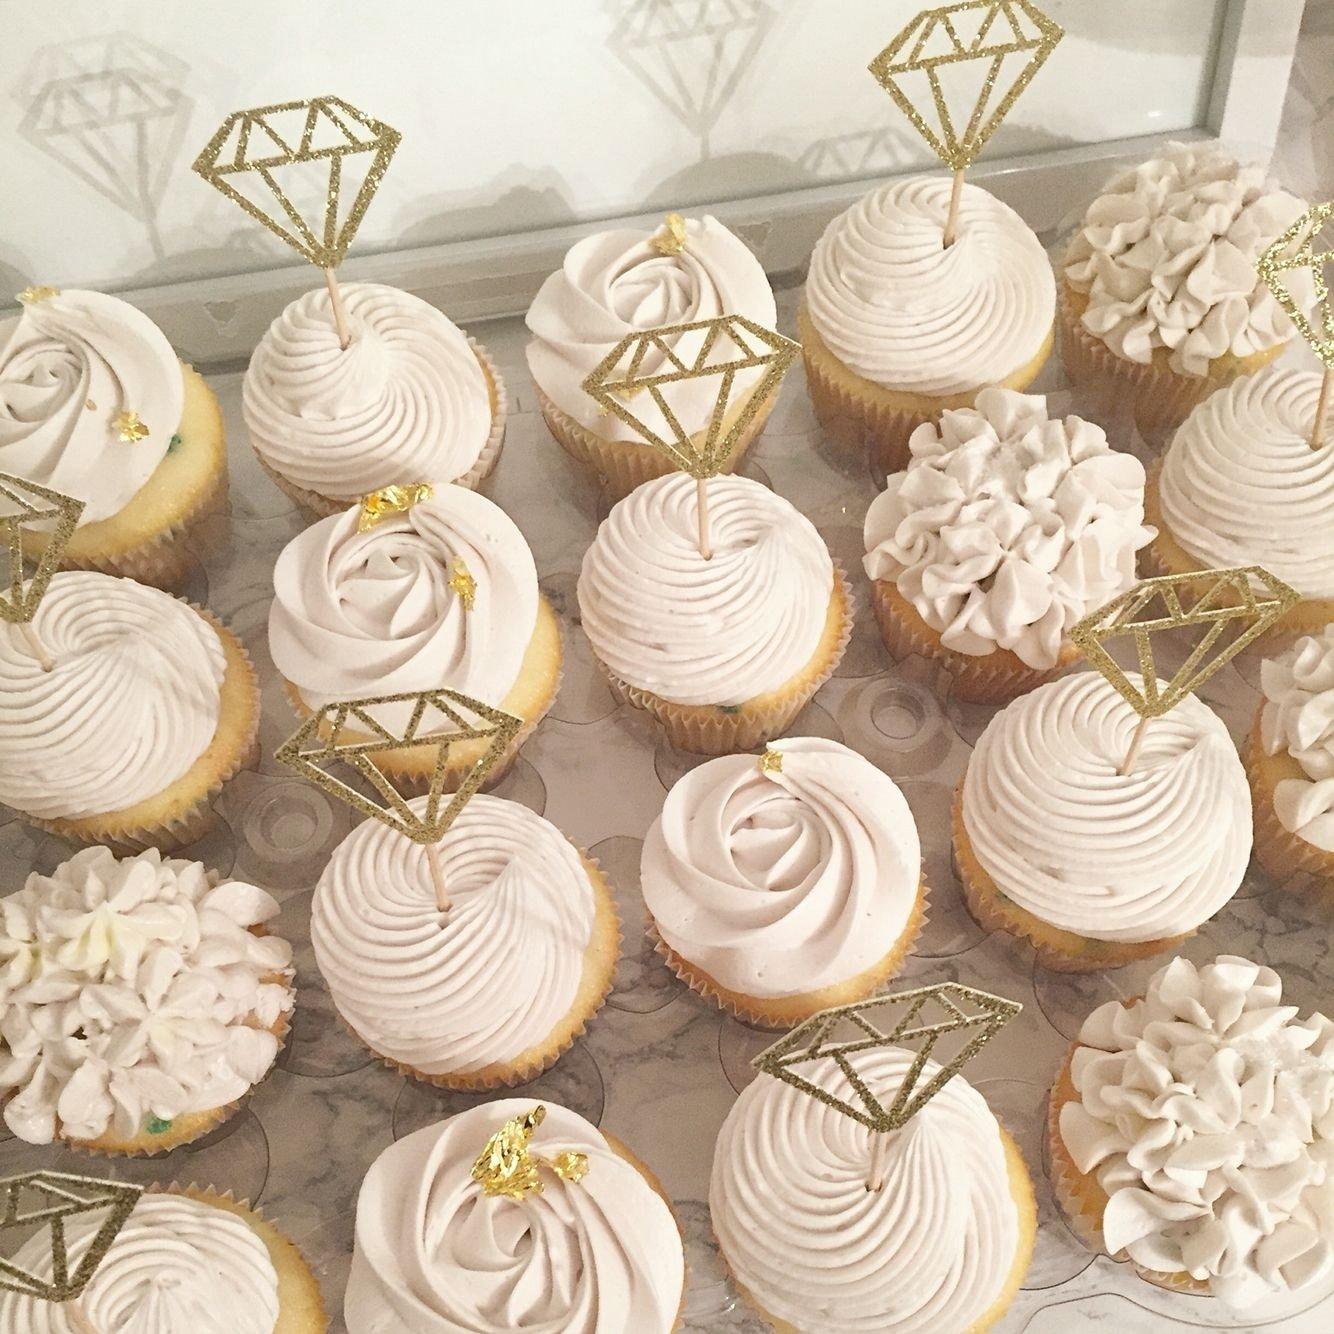 10 Beautiful Cupcake Ideas For Bridal Shower bridal cupcakes rustic shower hydrangea roses diamond ring 2020